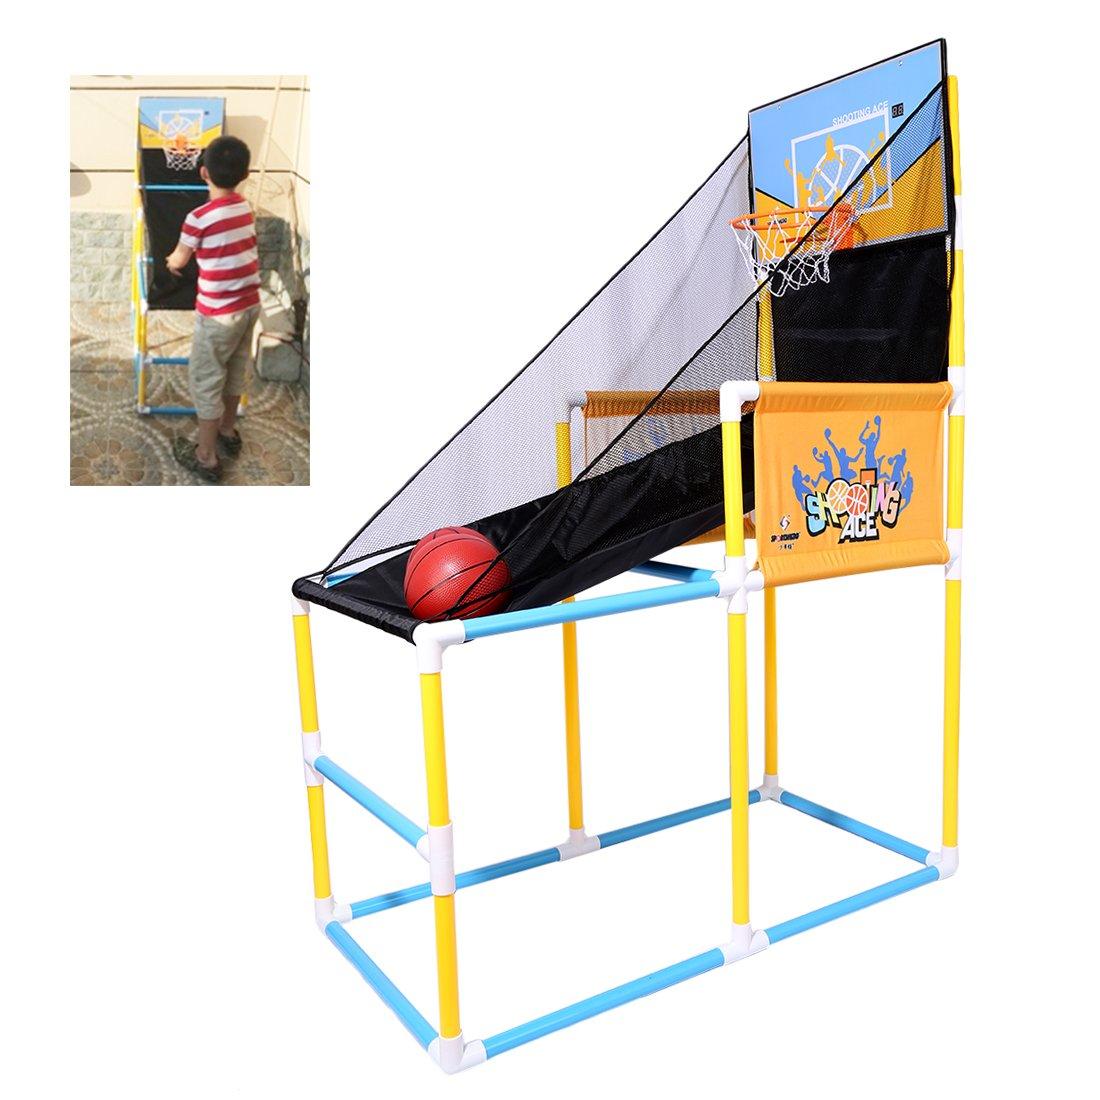 PINCHUANGHUI Automatic Scoring Basketball Shooting Machine Kids Teenagers Shooting Hoop by PINCHUANGHUI (Image #7)